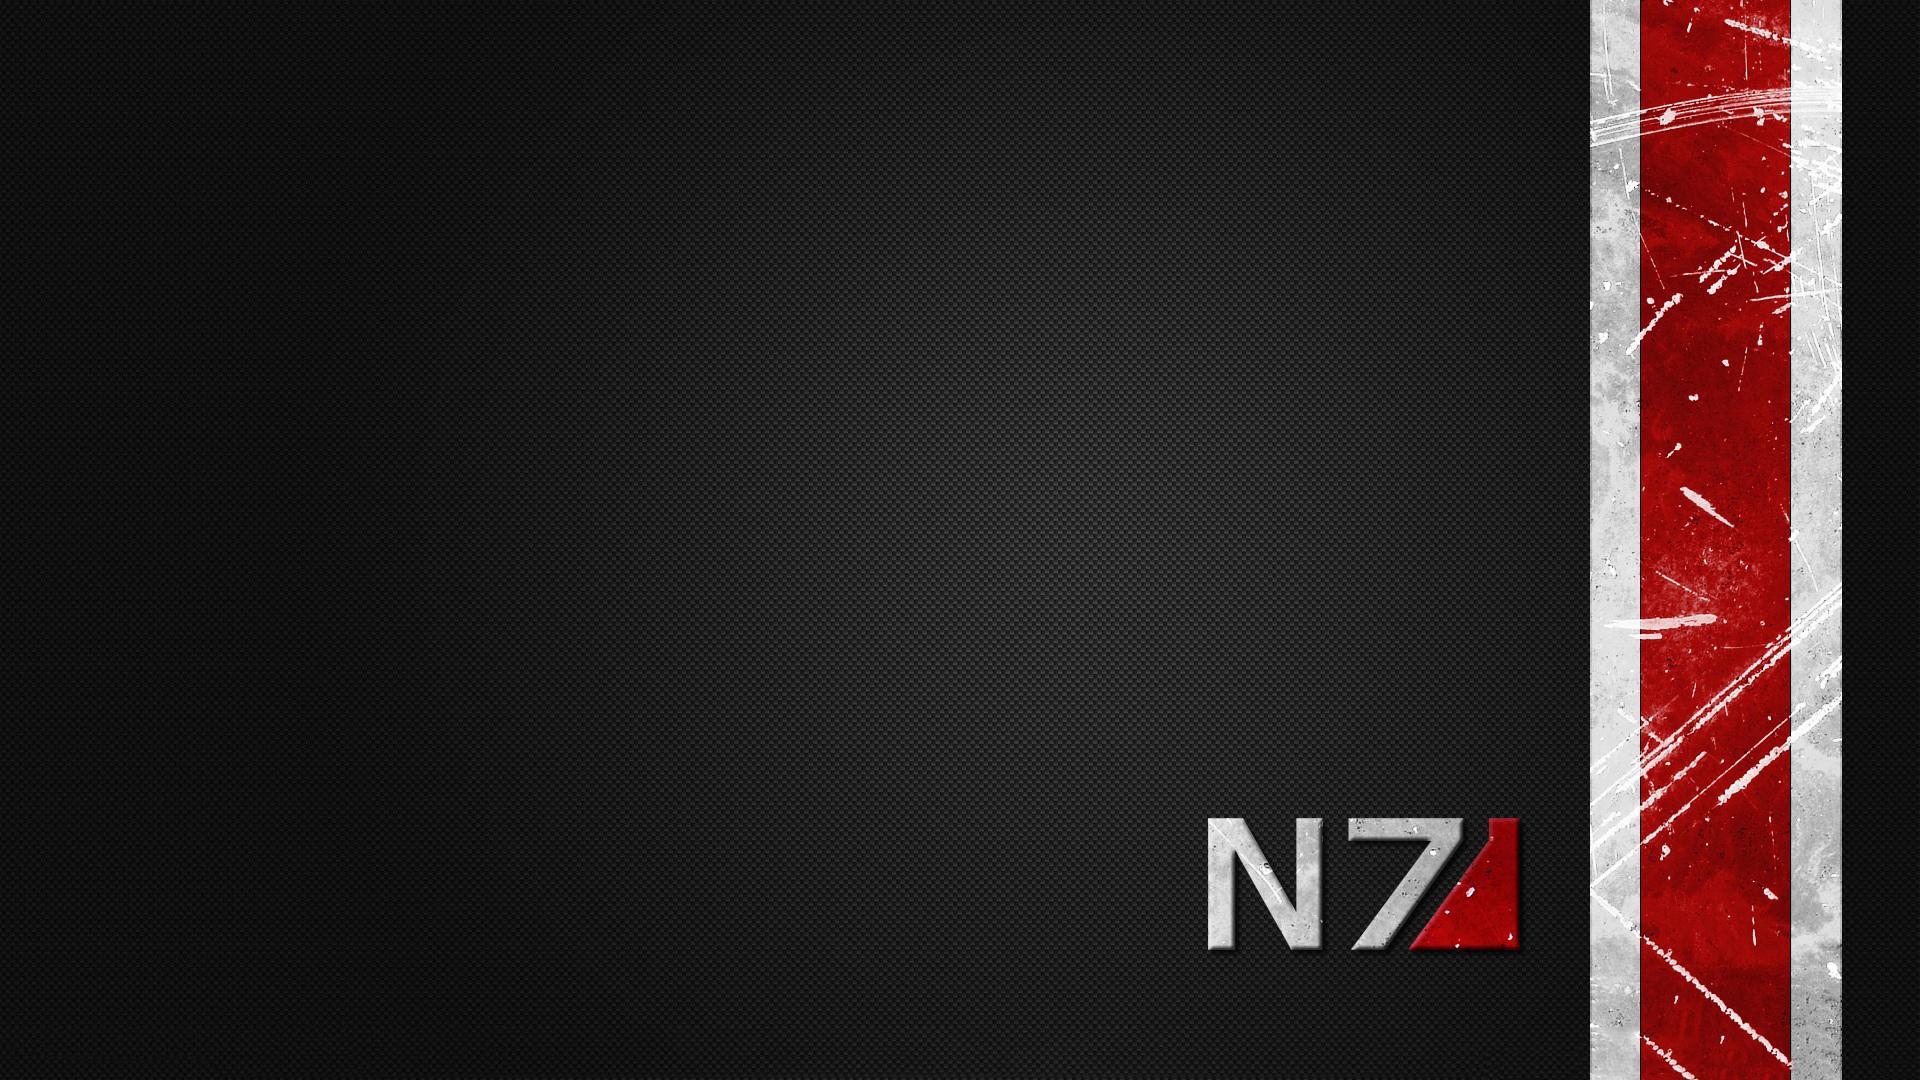 [47+] Mass Effect N7 Wallpaper on WallpaperSafari